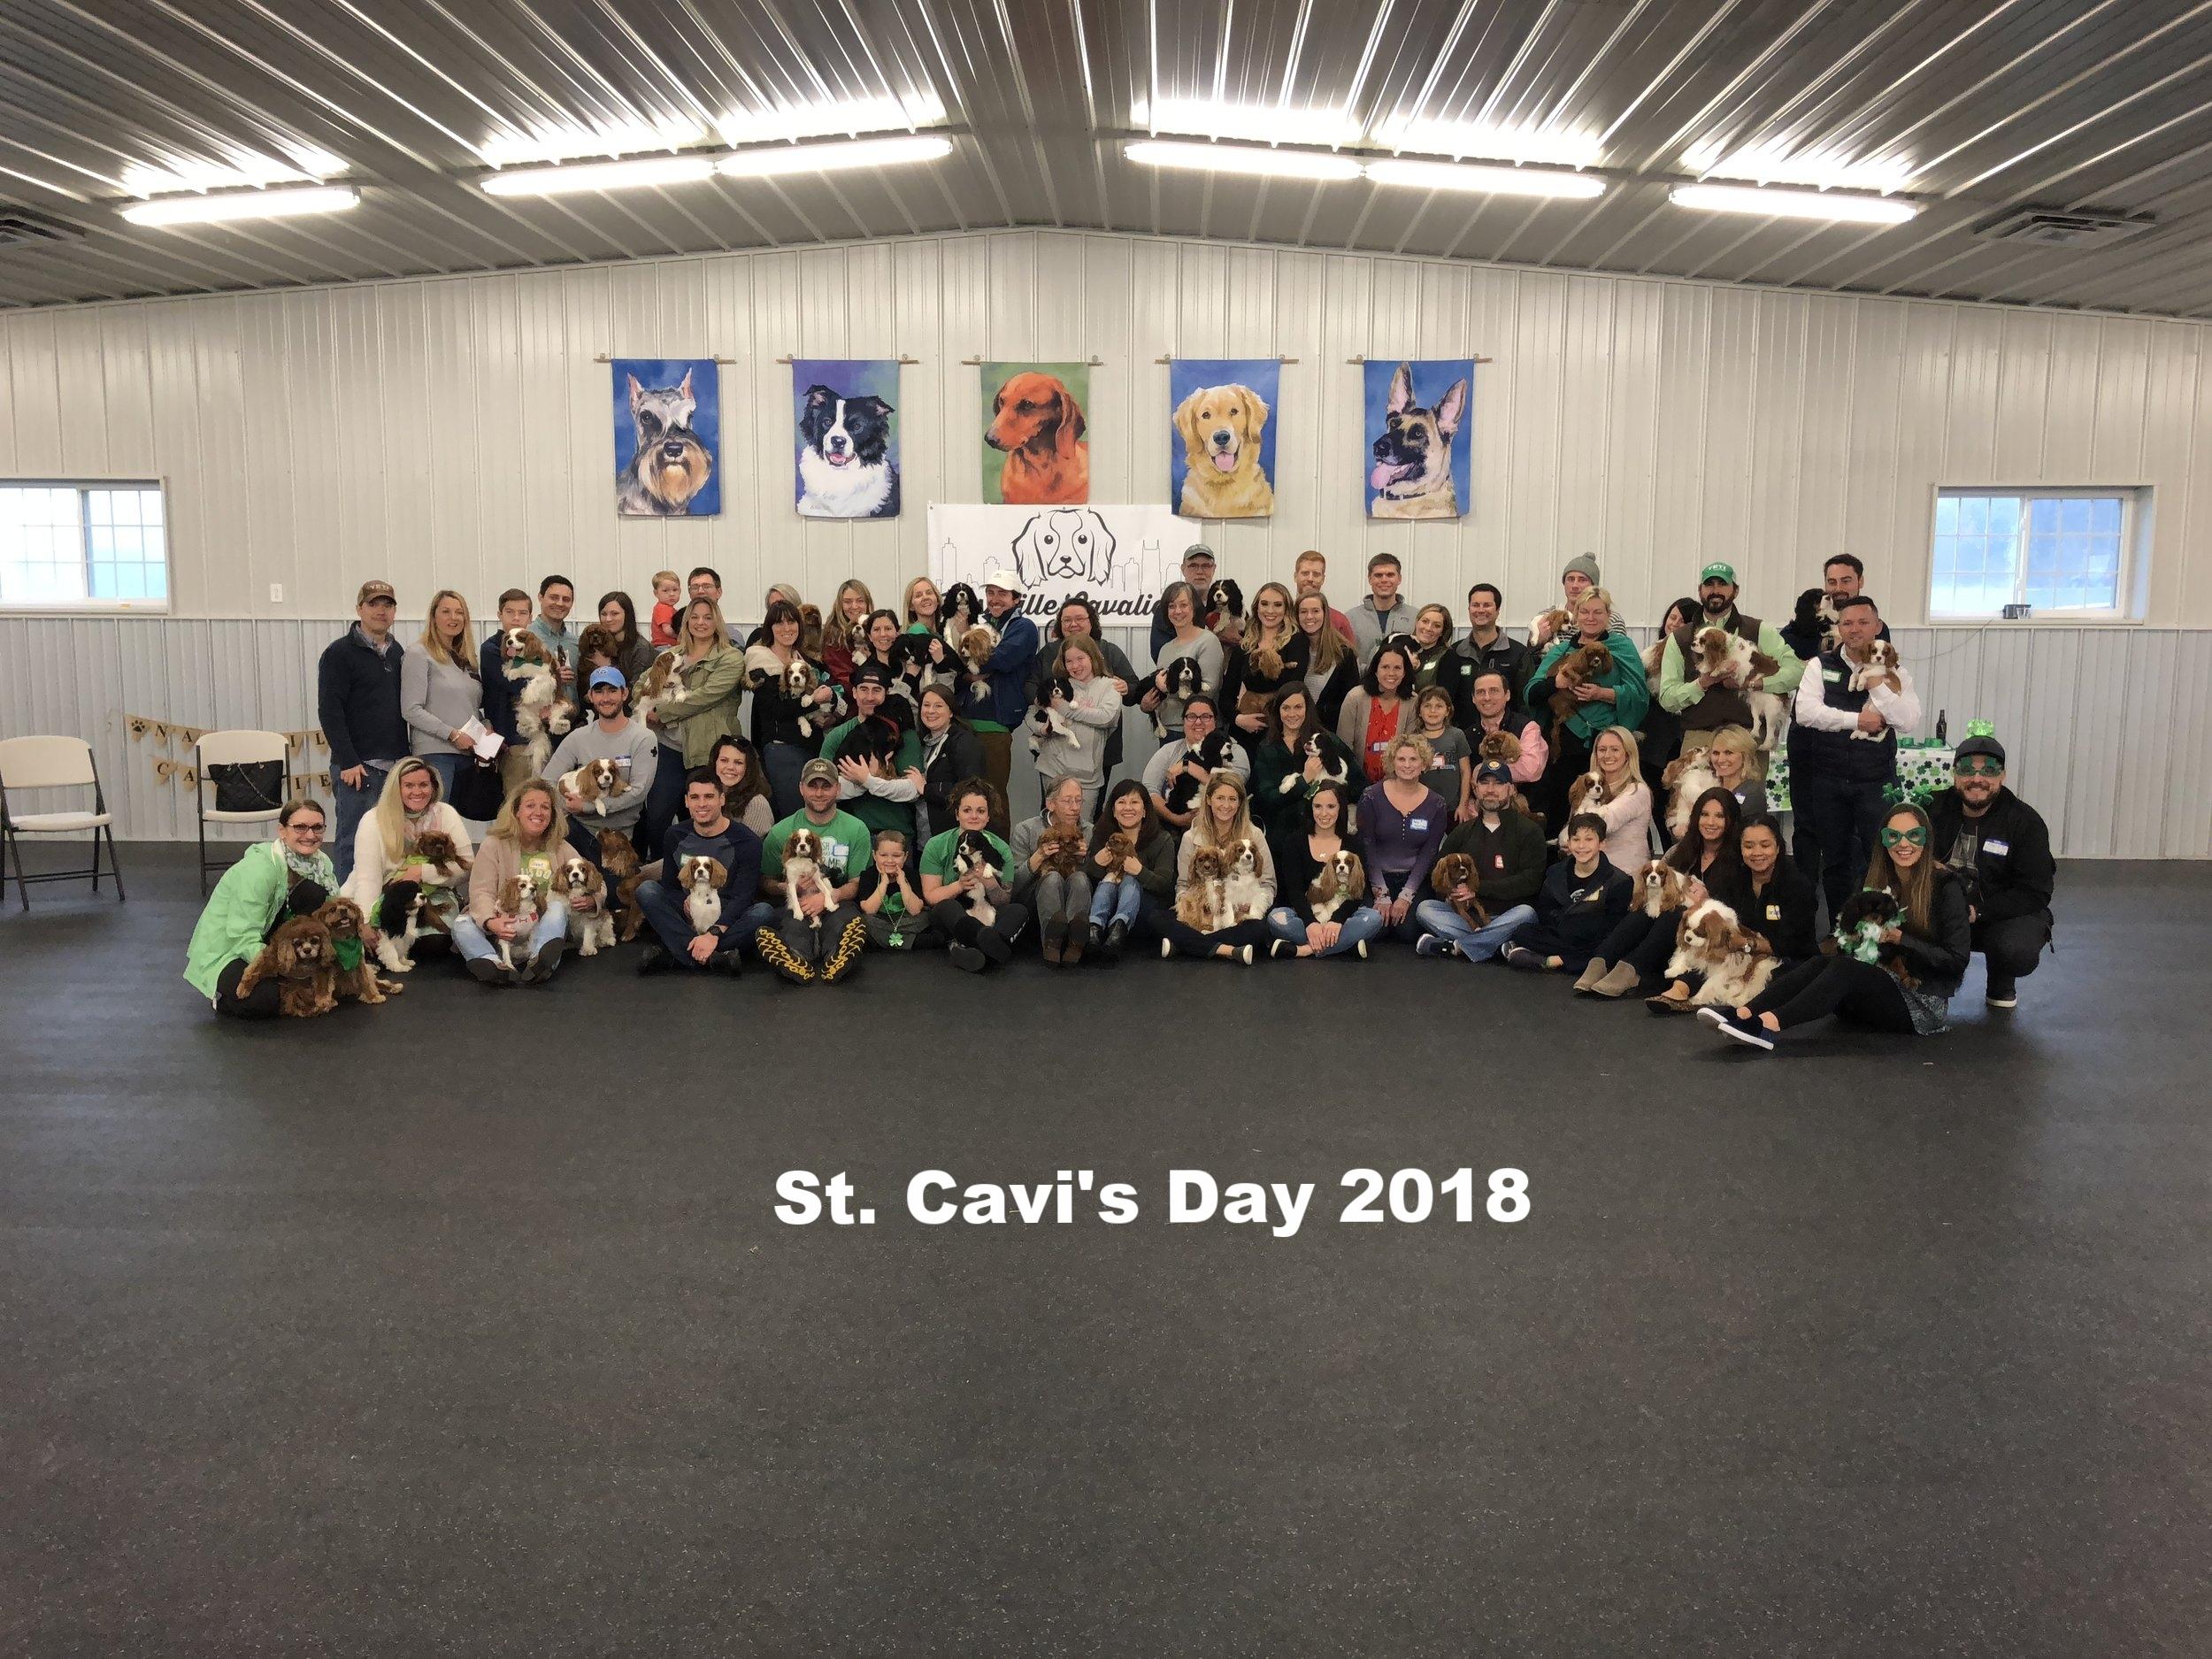 St Cavis Day .JPG